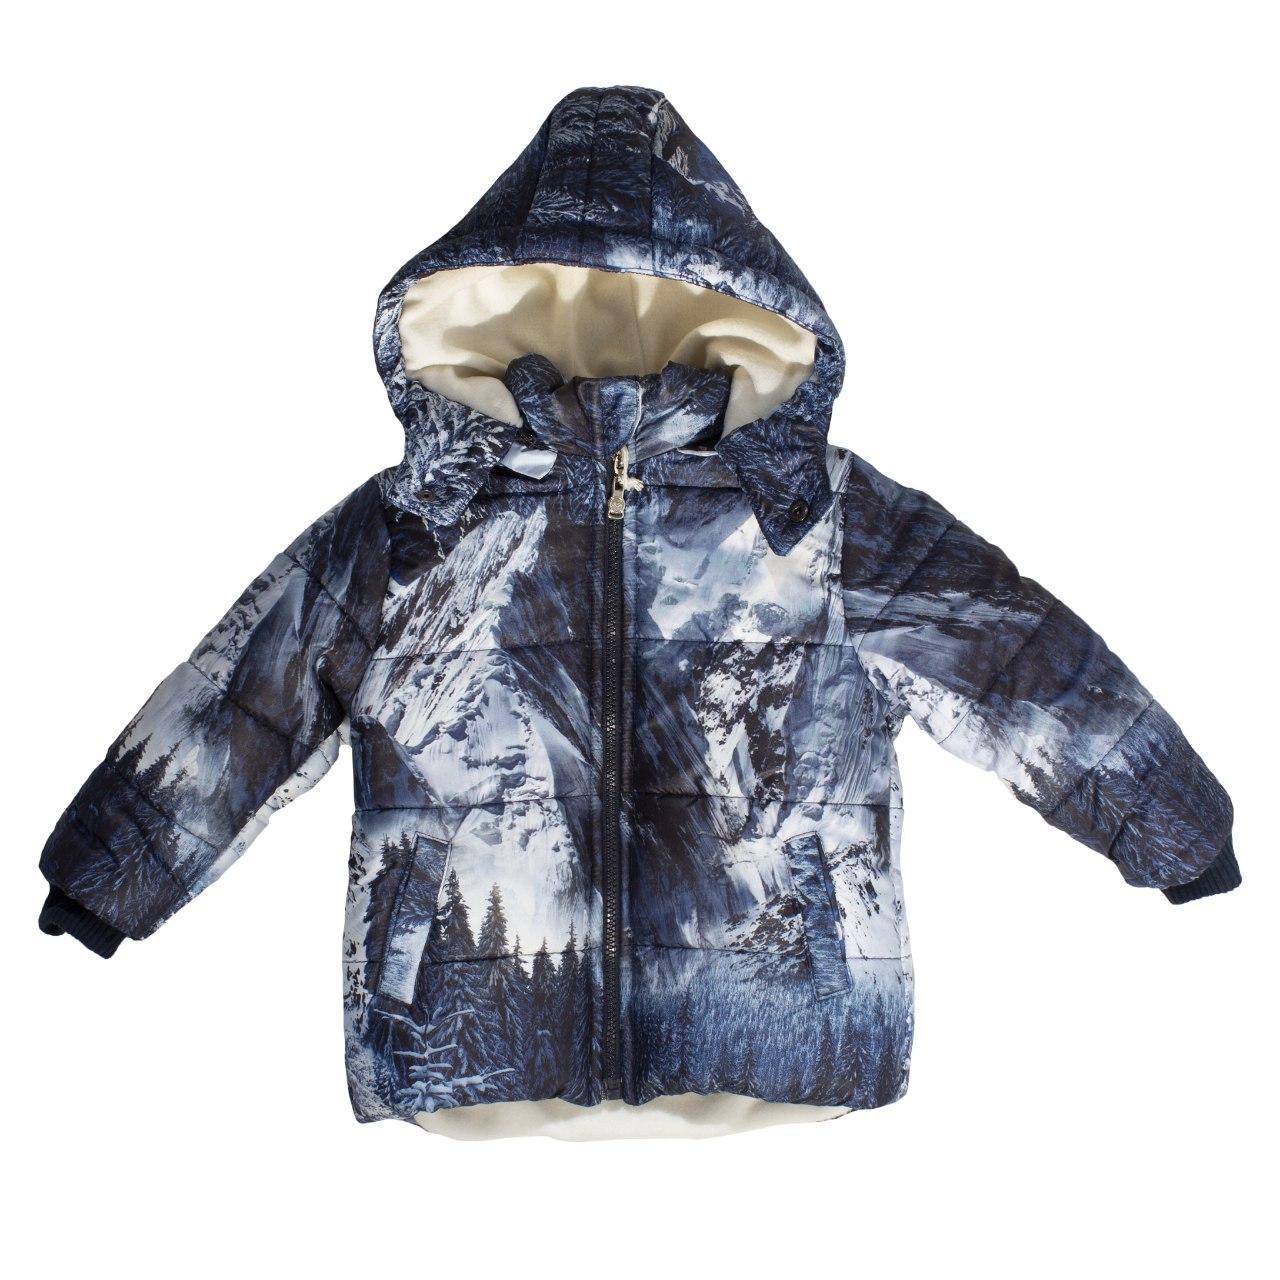 Зимняя куртка для мальчика, еврозима, размер 3 года